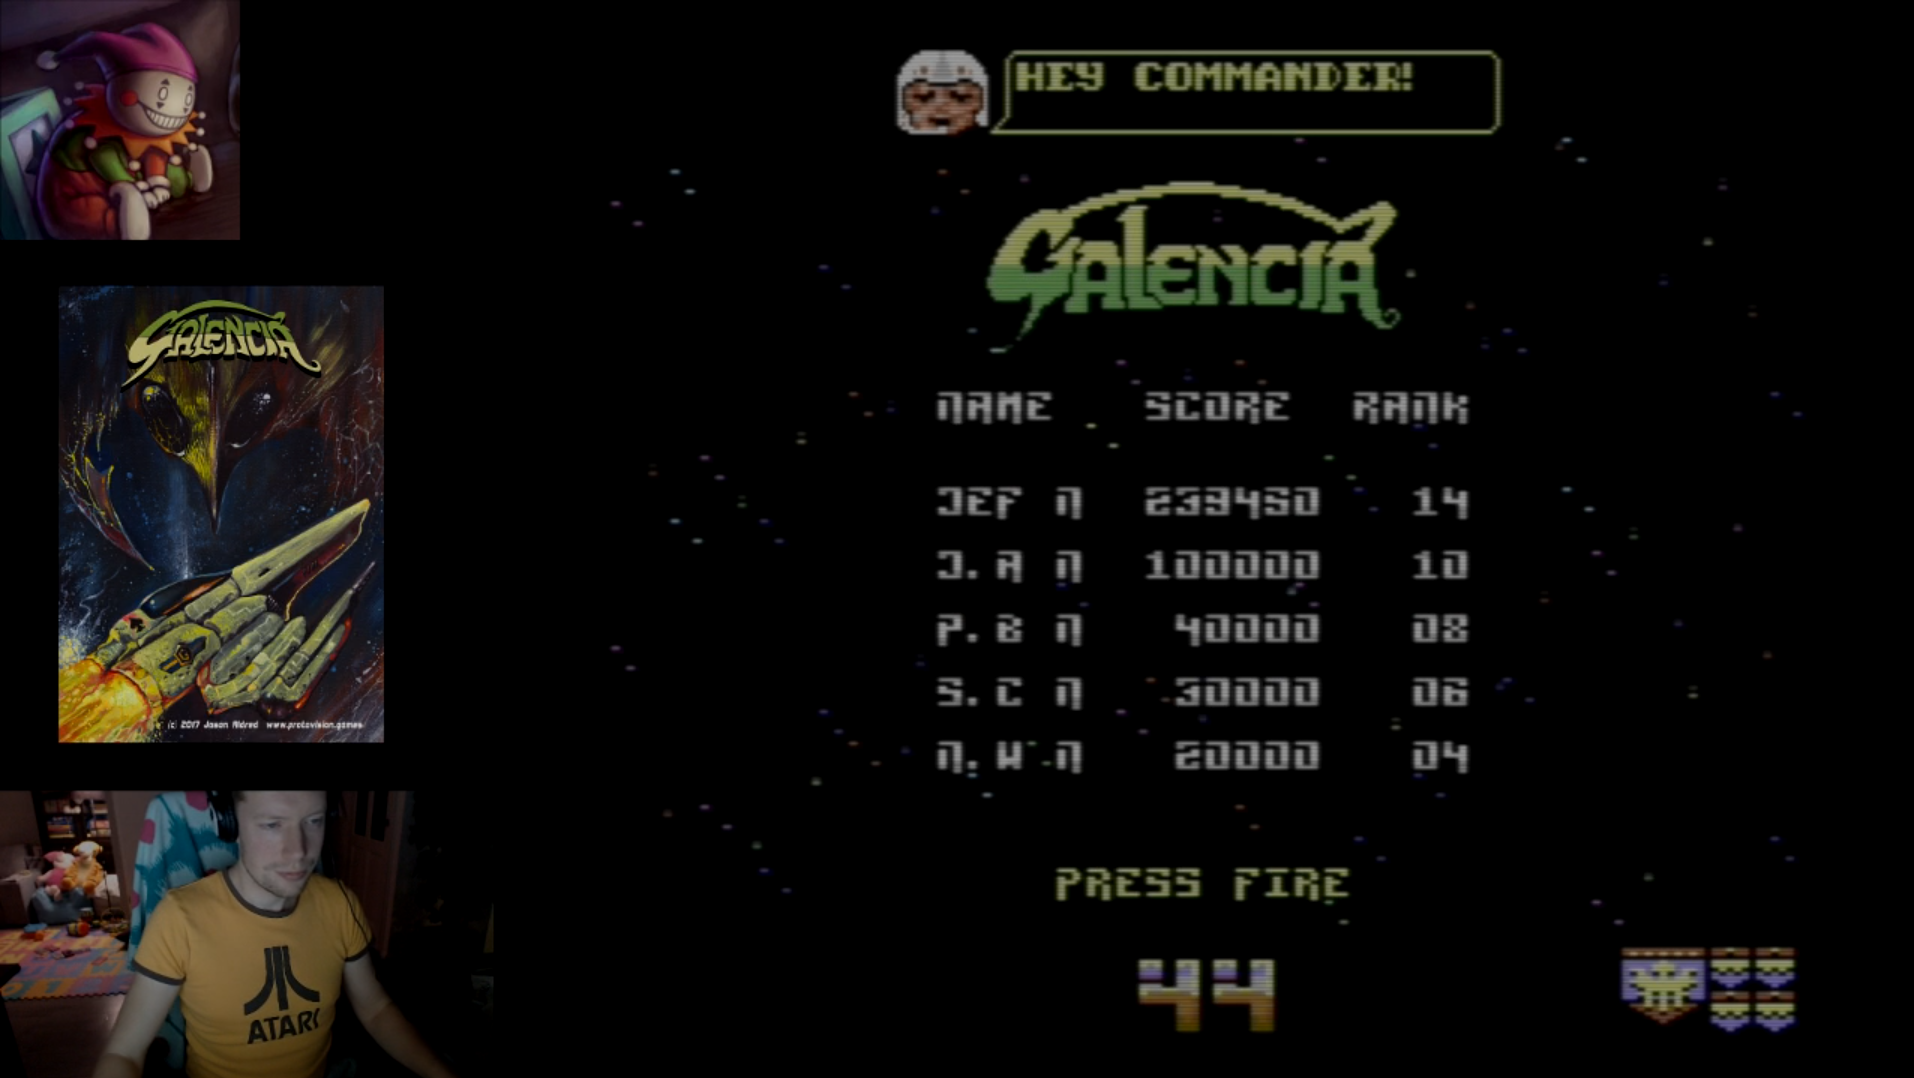 Galencia [Normal] 239,450 points